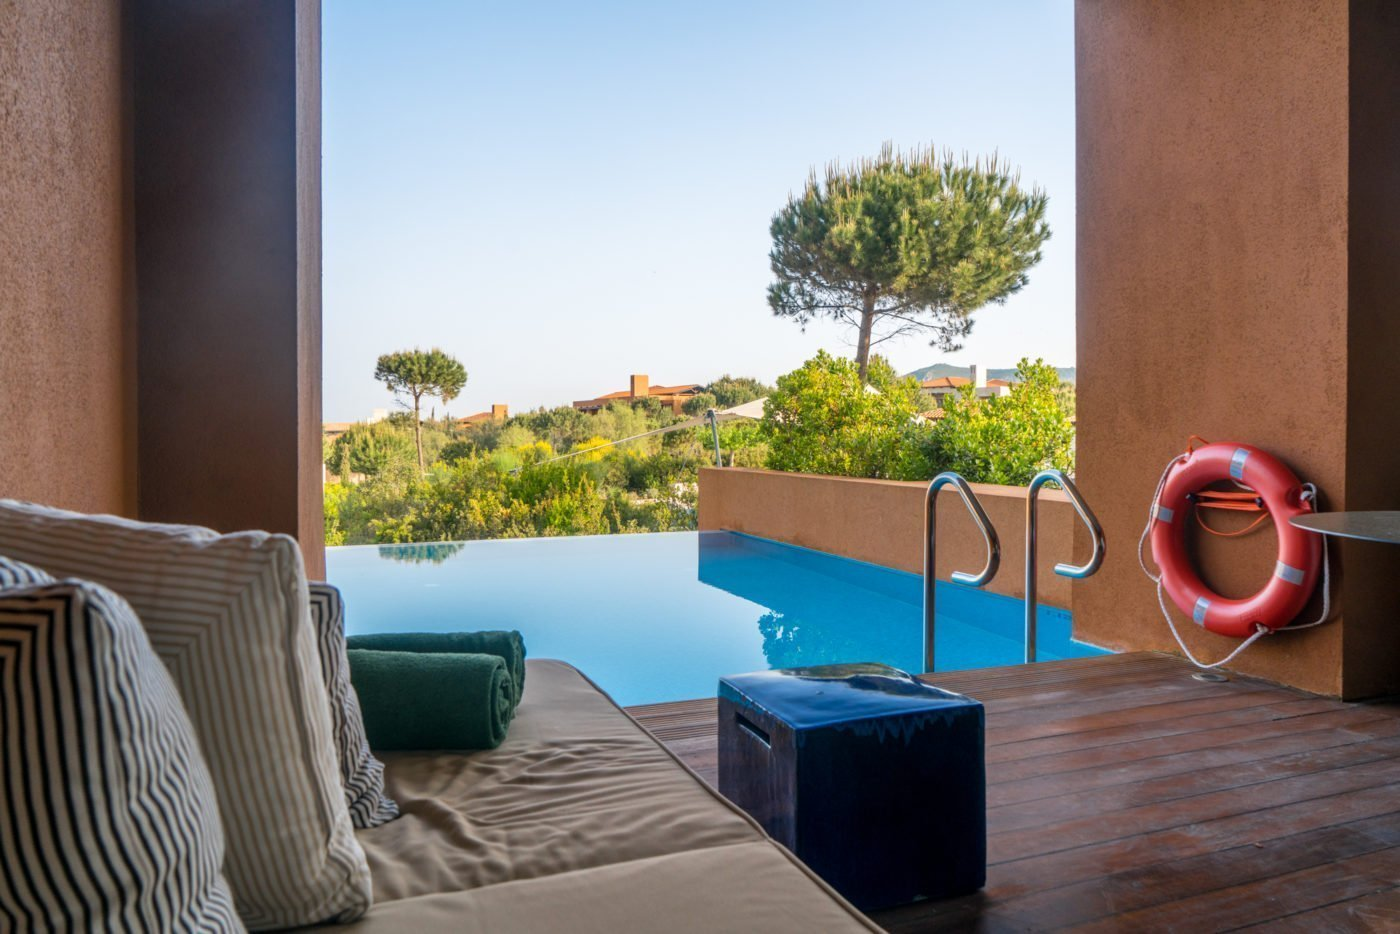 Infinity Pool from the Infinity Room at The Romanos, Costa Navarino, Greece